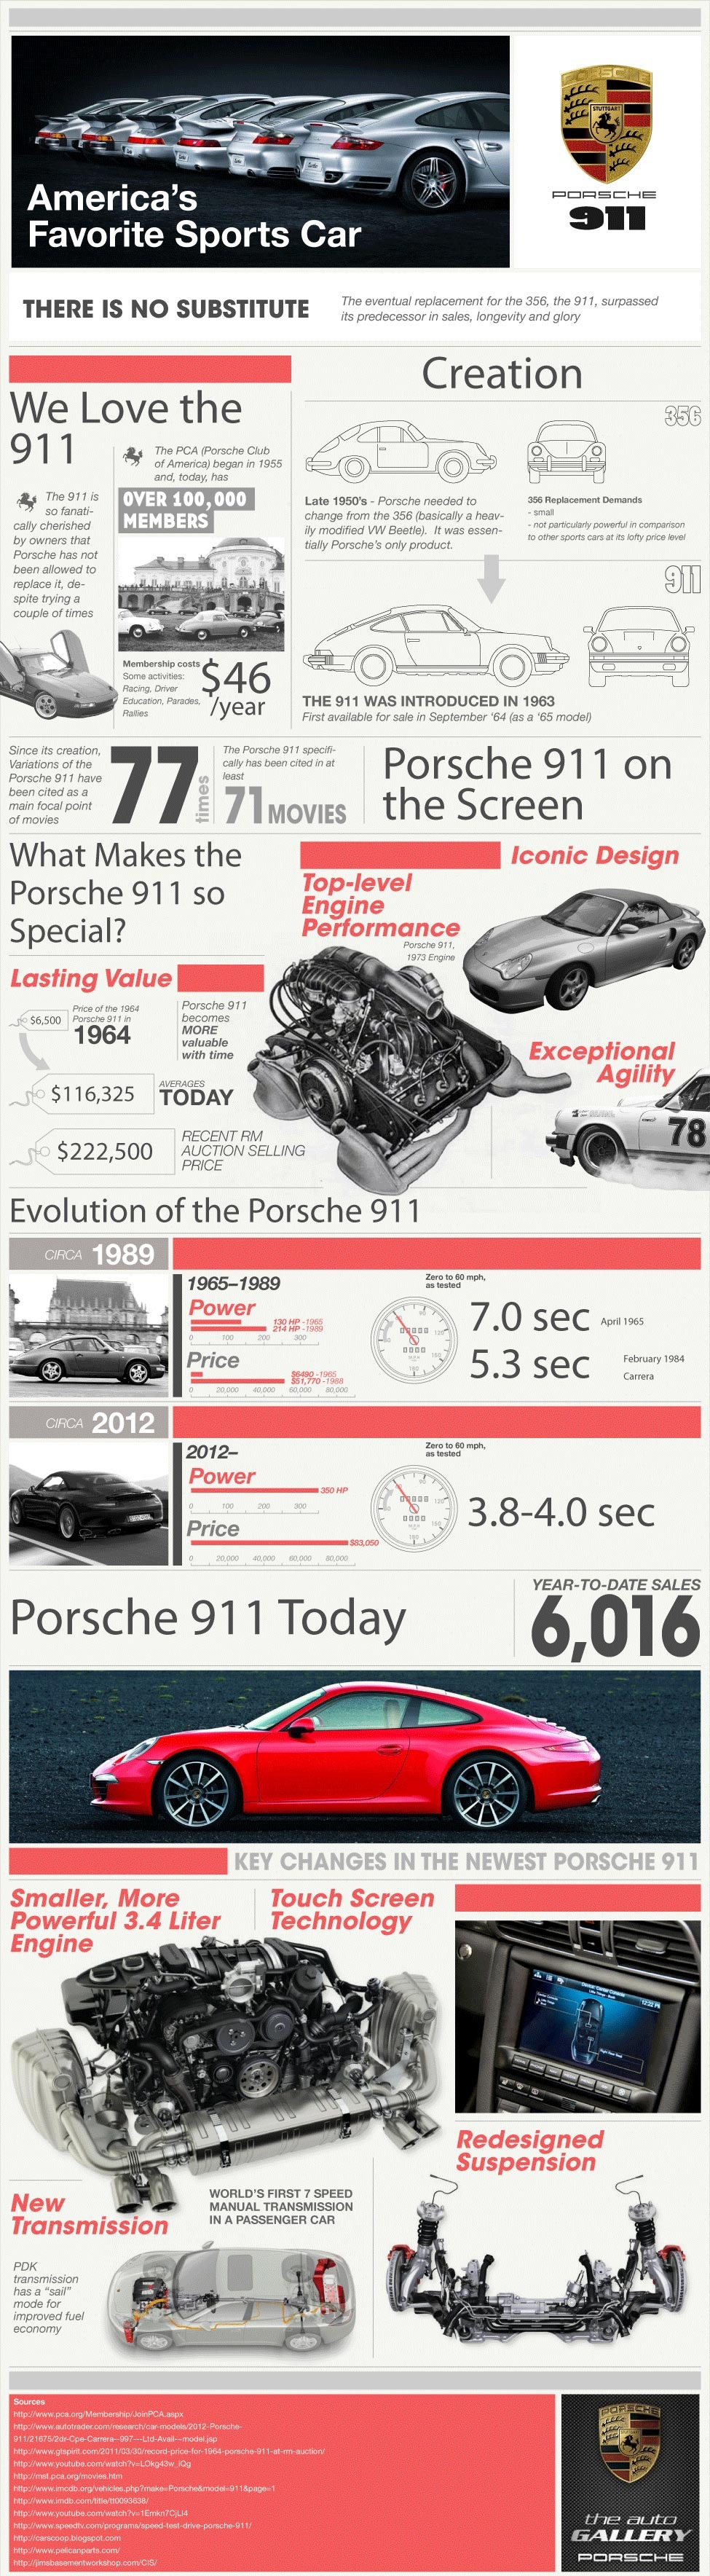 Porsche 911 History Infographic